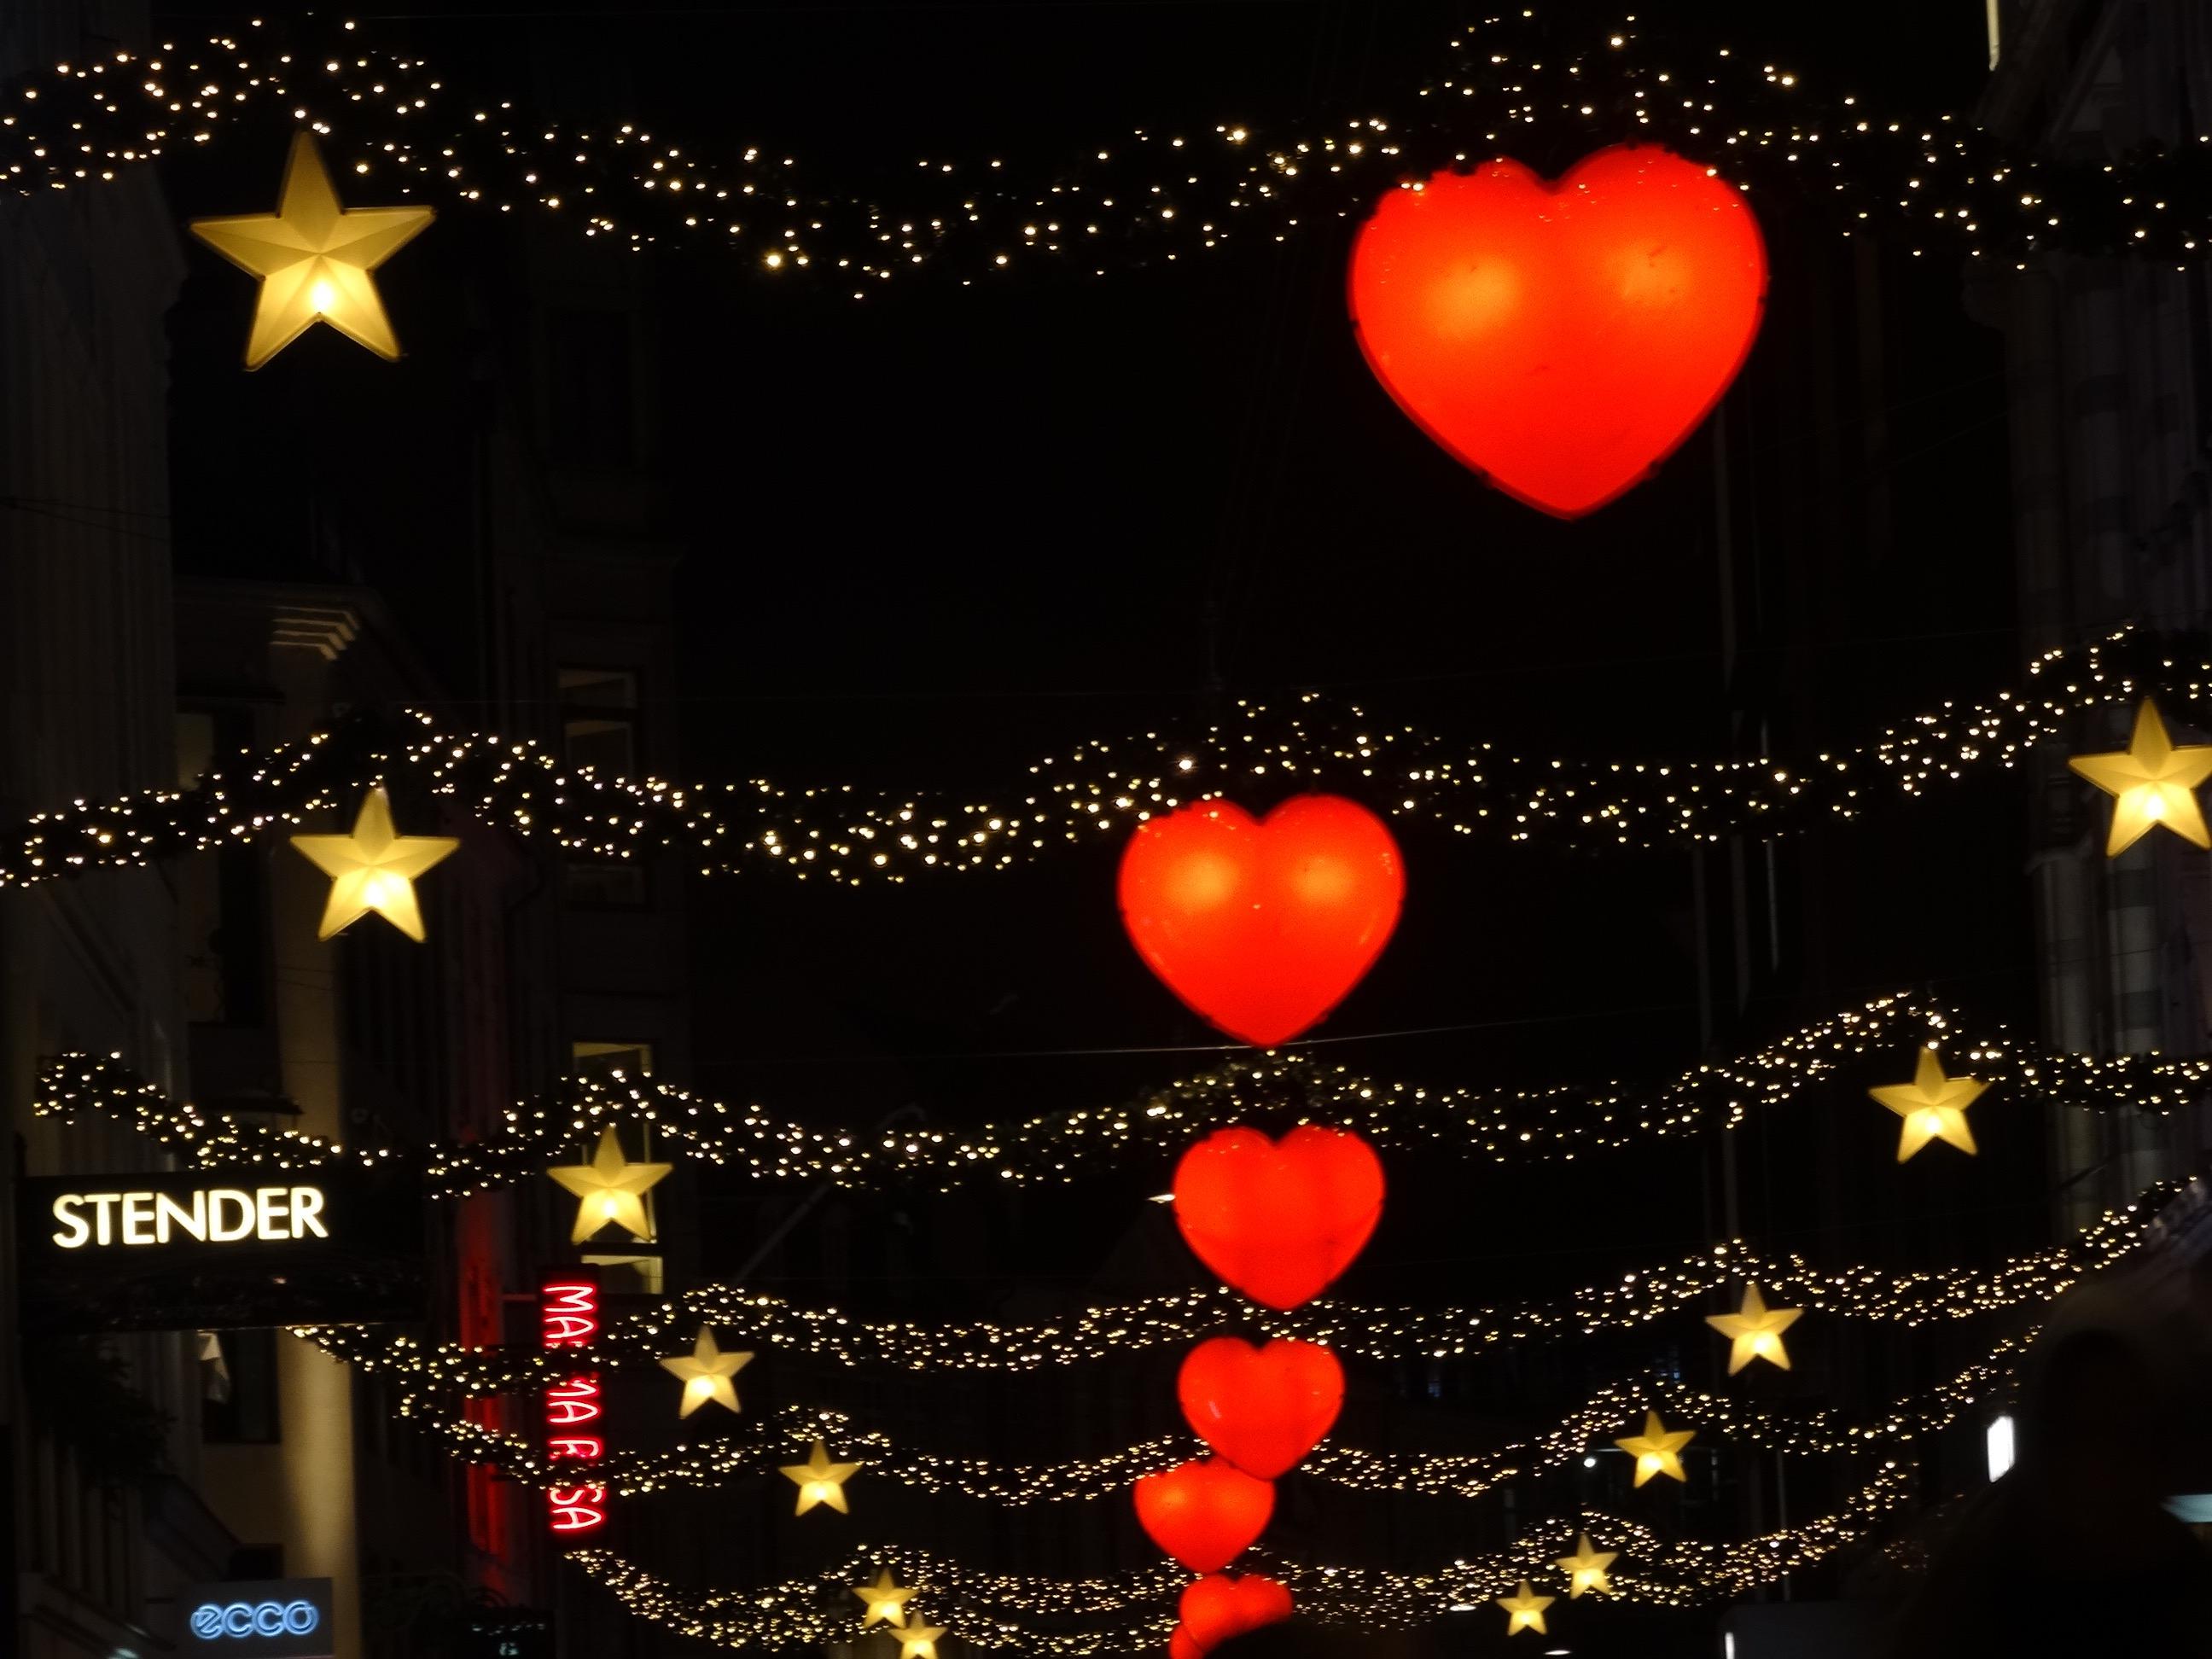 present copenhagen christmas lights dsc01507 dsc01508 dsc01524